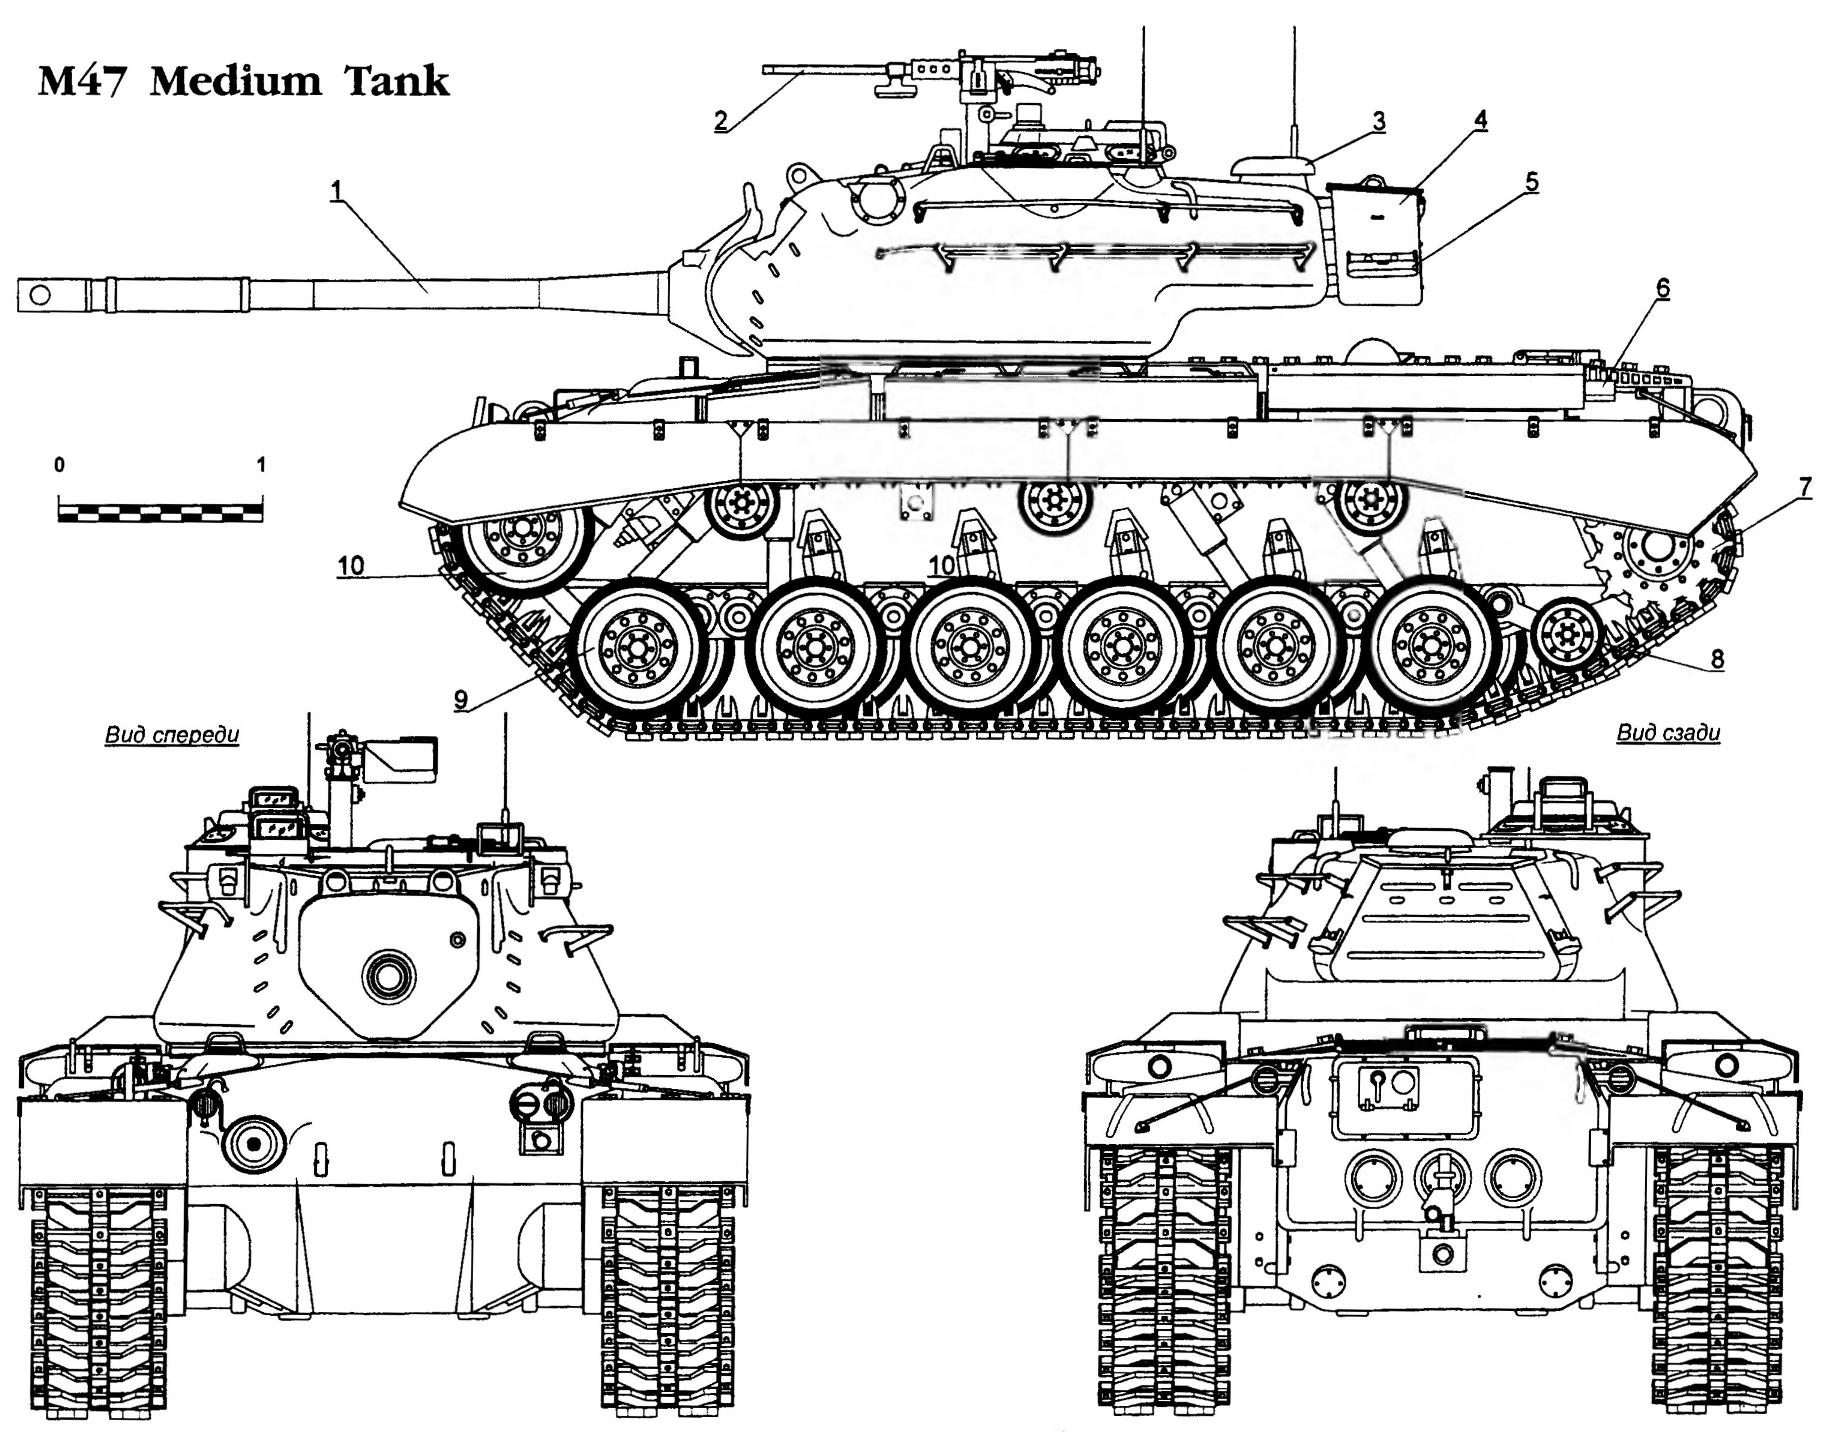 M47 Medium Tank